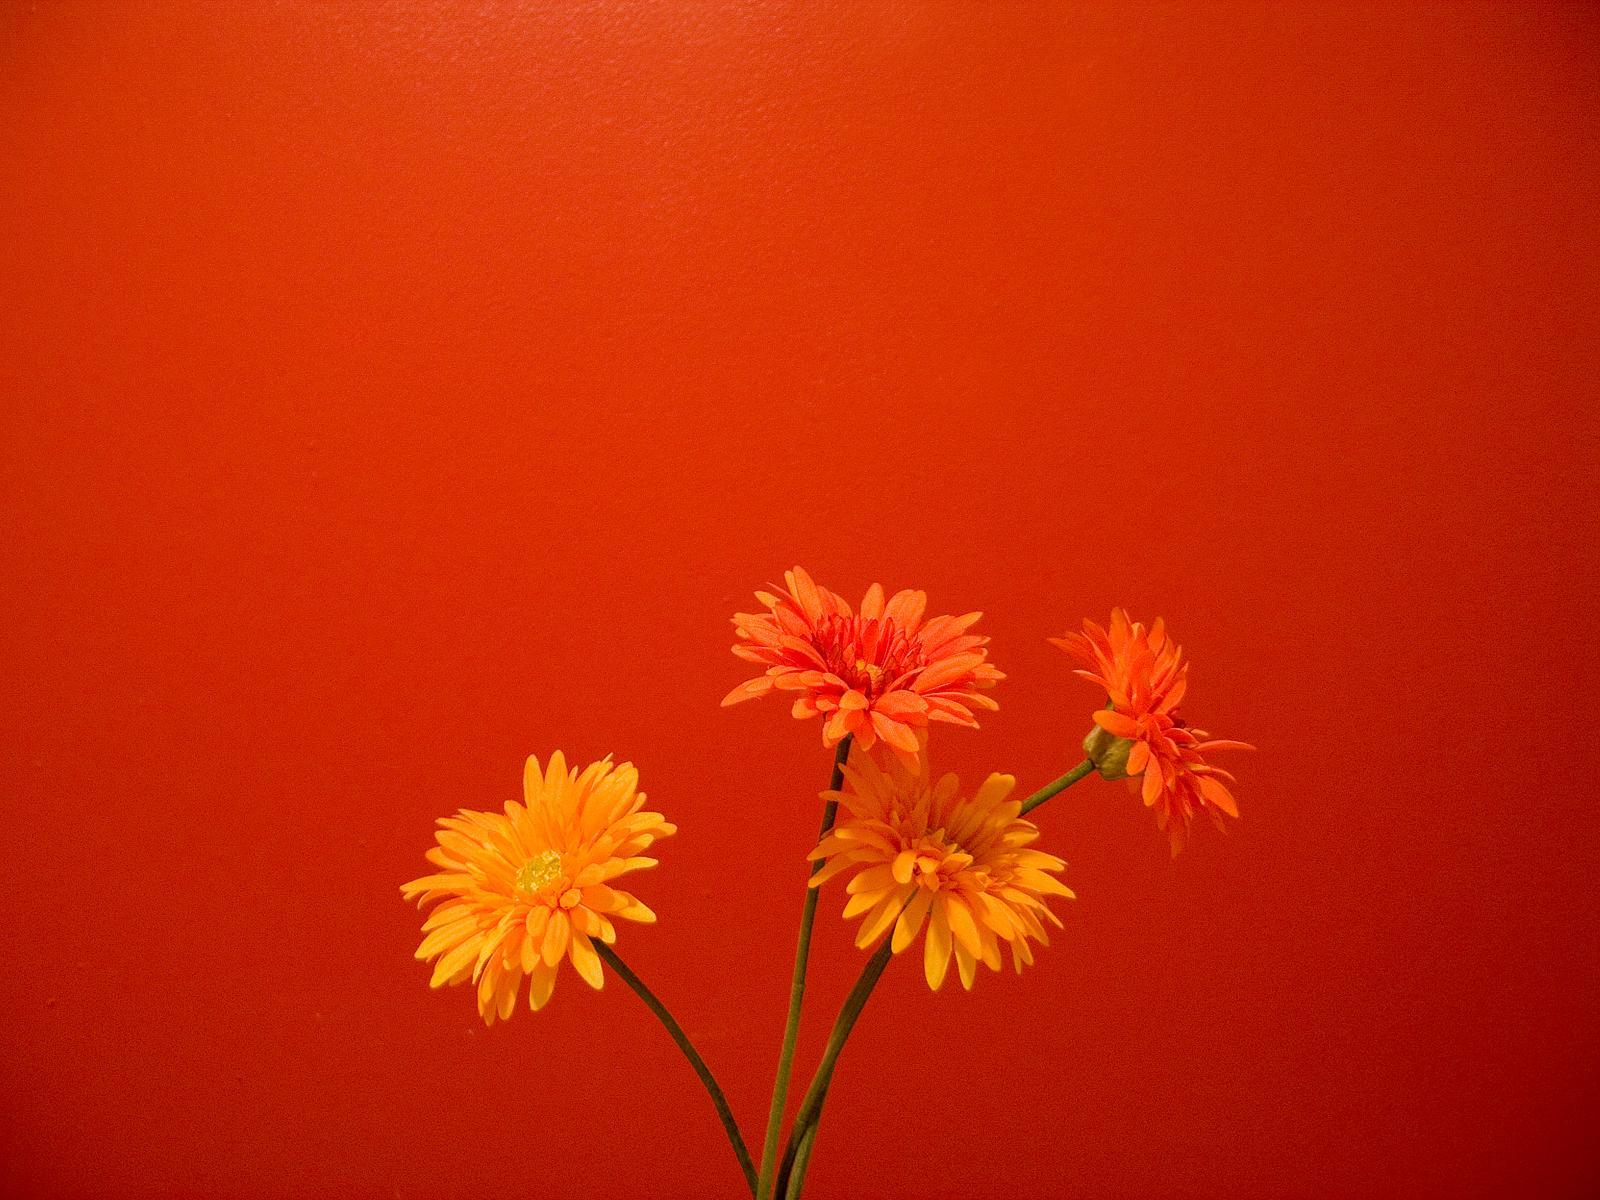 Hd Wallpapers For Iphone 4 Retina Display Orange Flowers Wallpapers Hd Wallpapers Id 5691